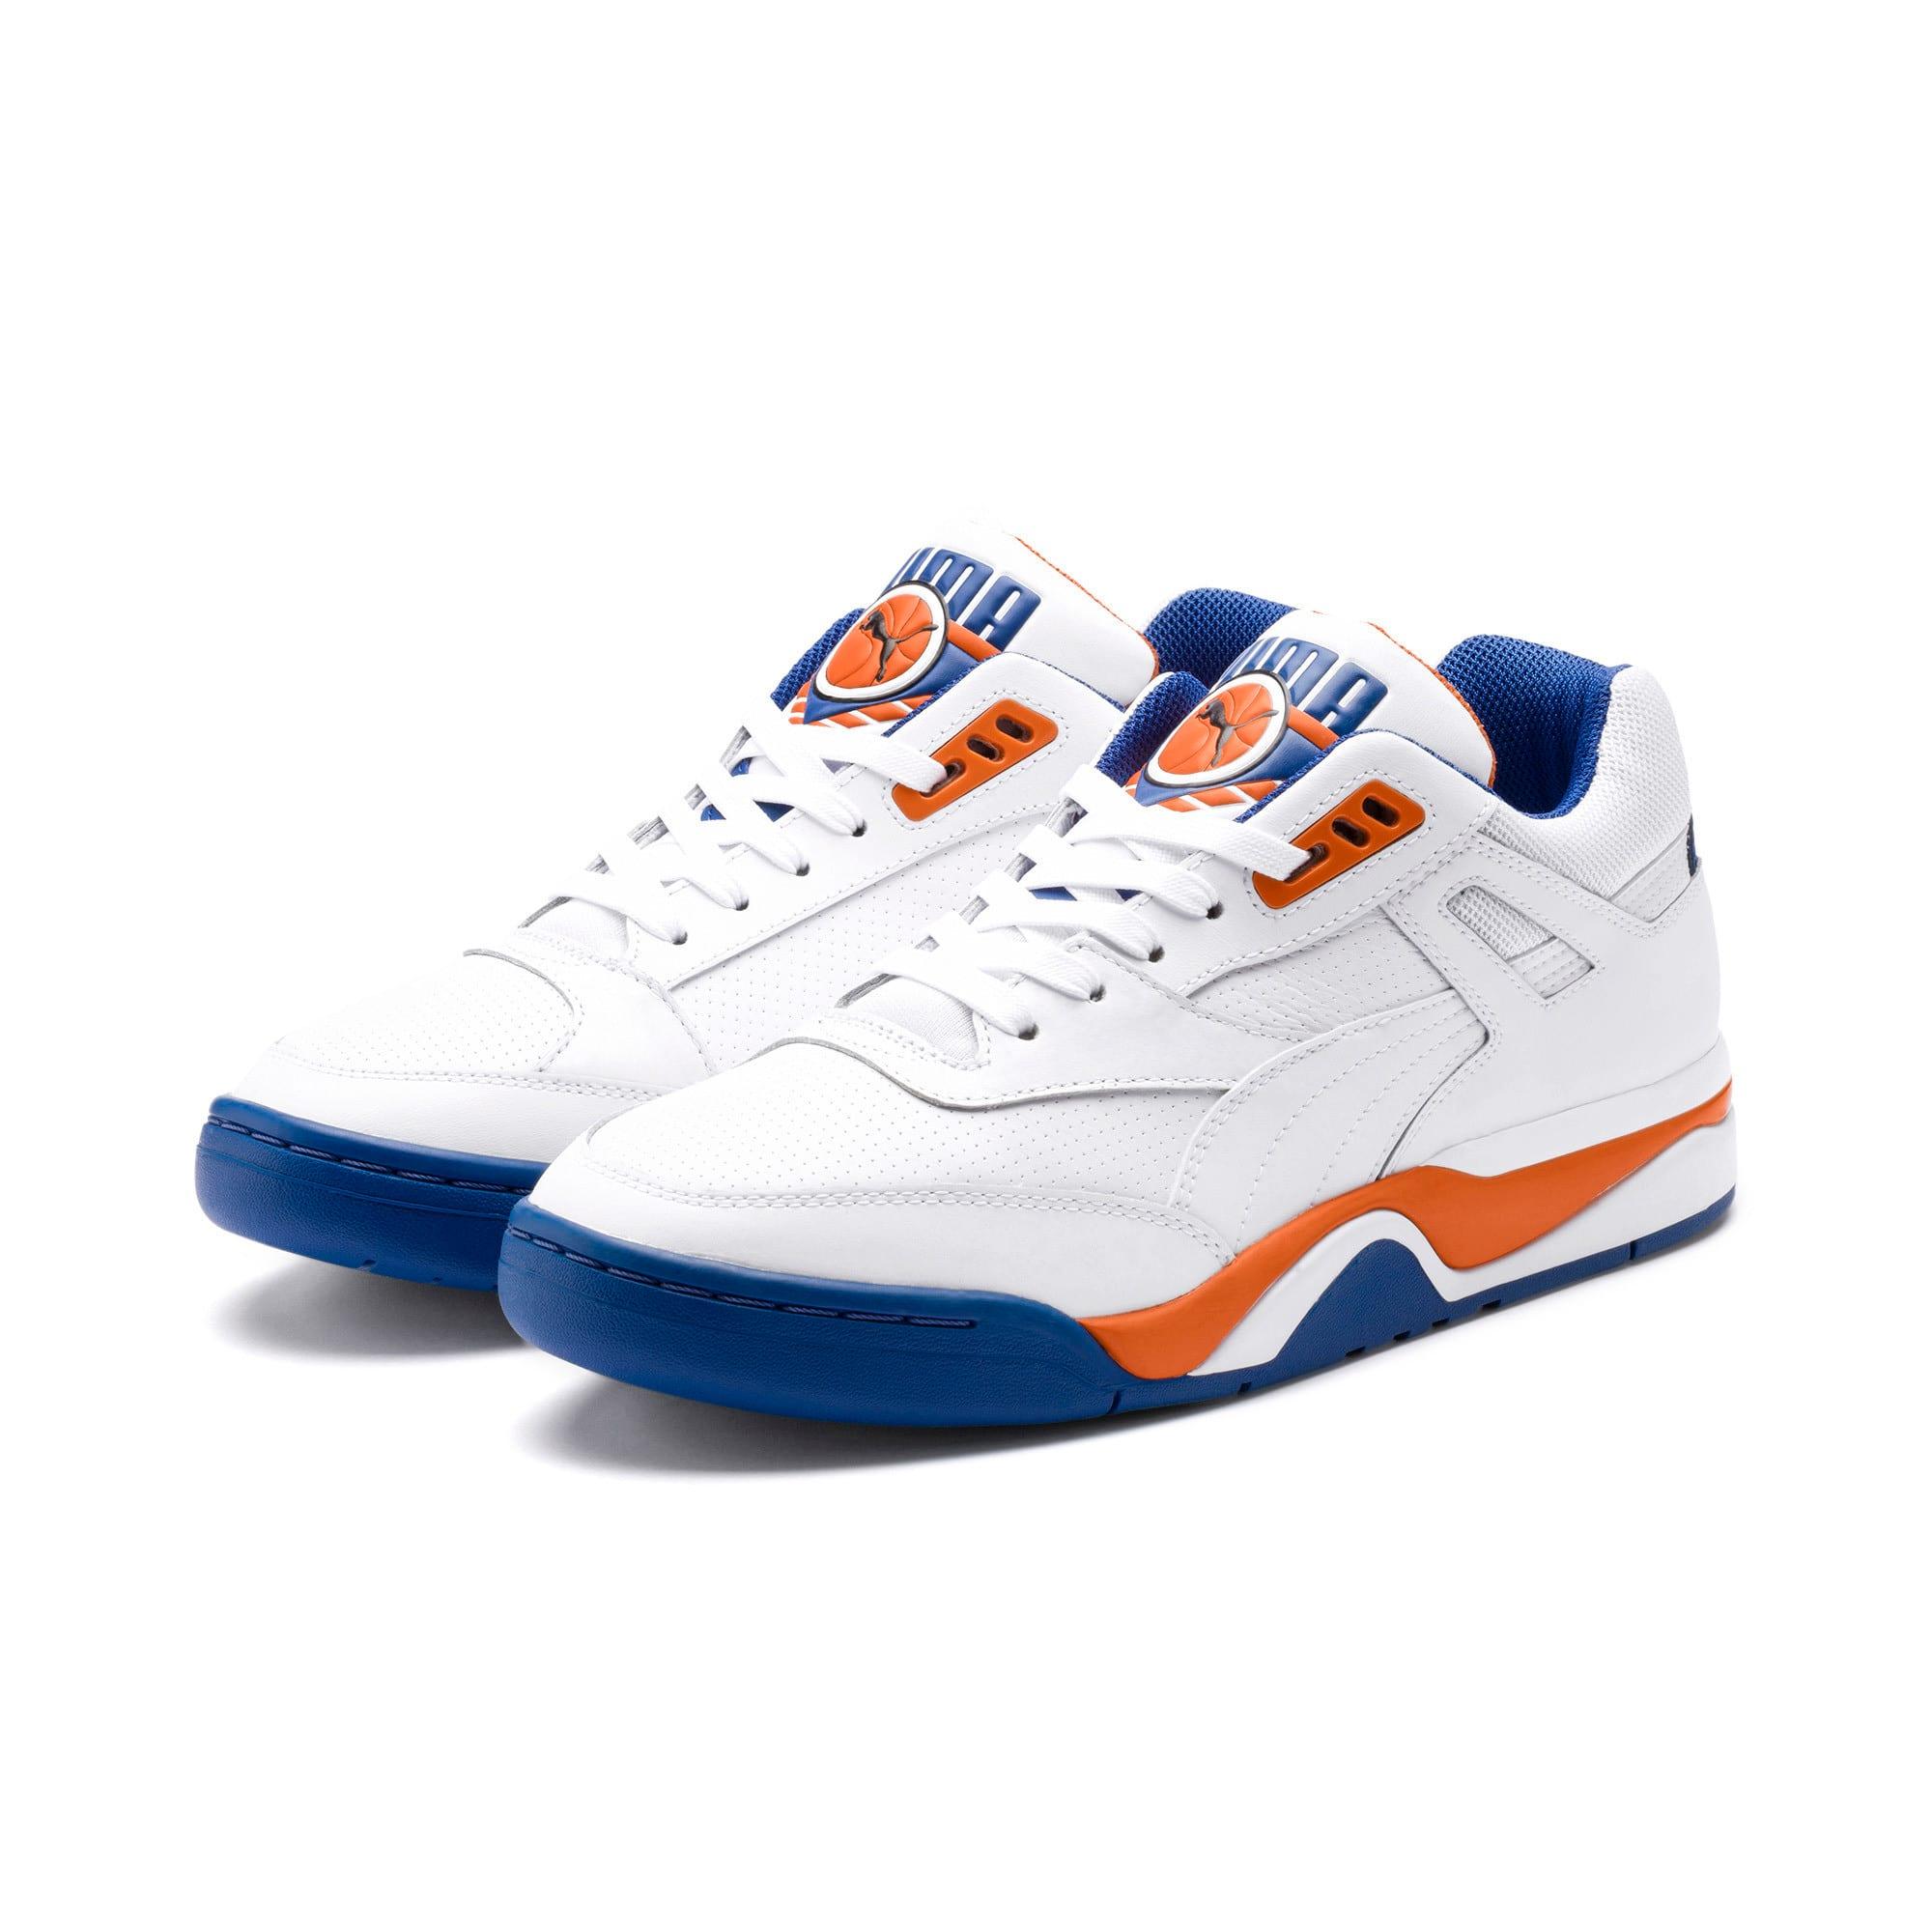 Imagen en miniatura 2 de Zapatillas de baloncesto de hombre Palace Guard, P White-Jaffa Orange-G Blue, mediana